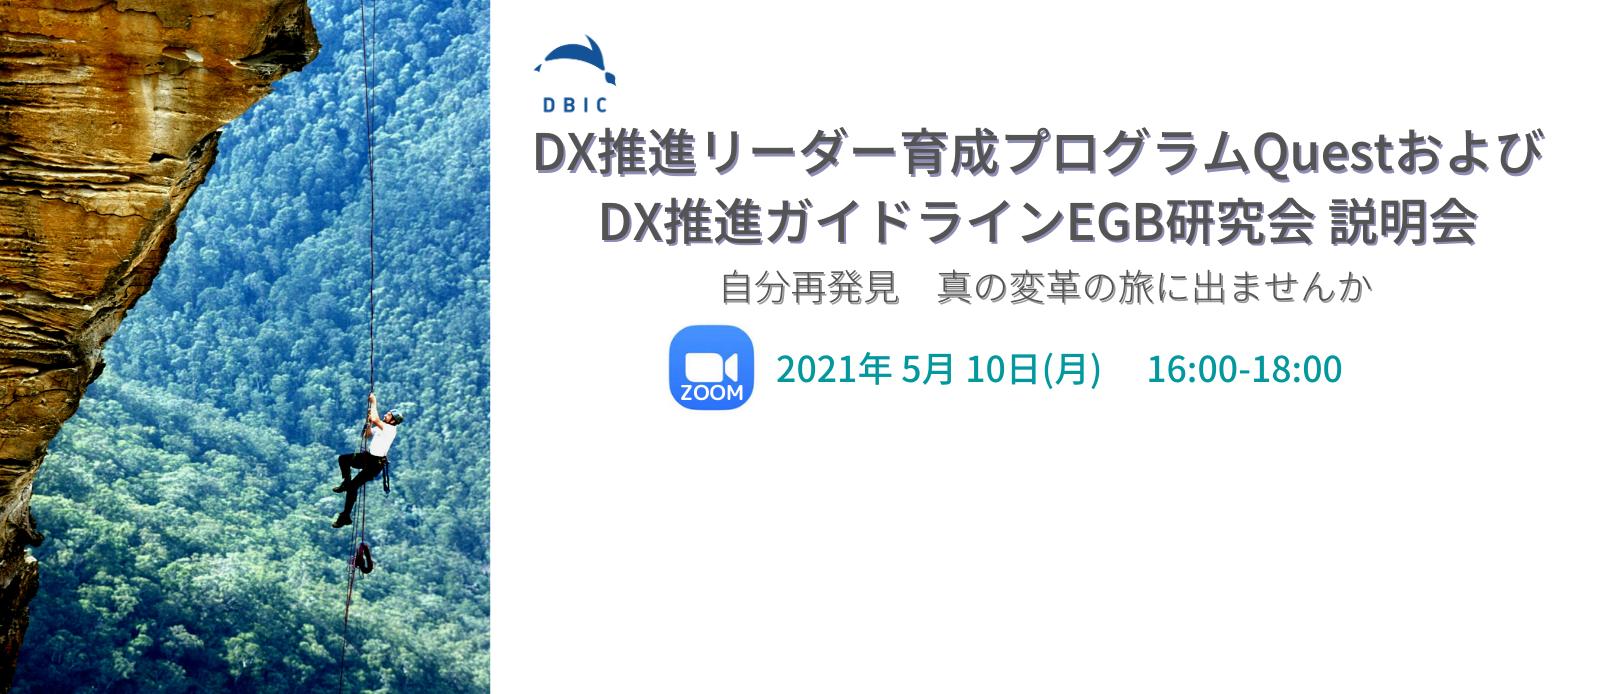 日本初 DX推進リーダー育成 DX Questプログラム・EGB研究会 参加者募集 説明会